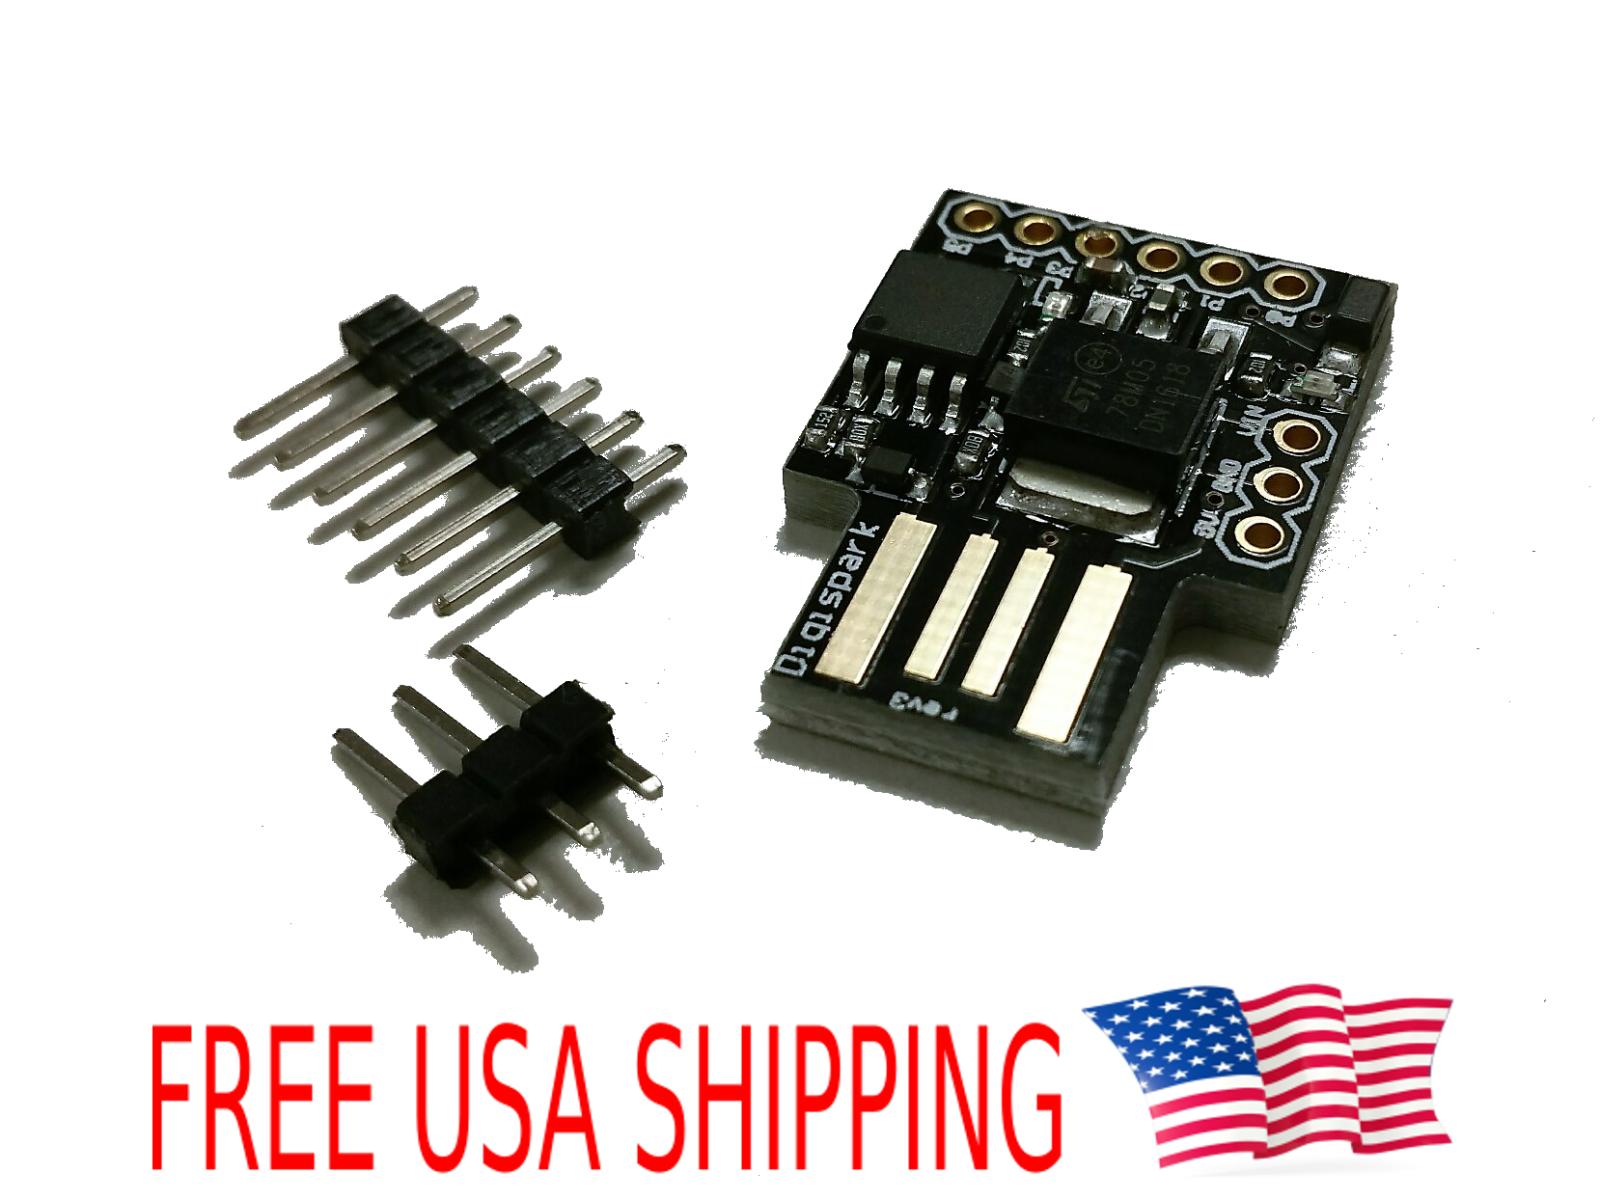 Digispark kickstarter development board ATTINY85 module Arduino usb US Shipping